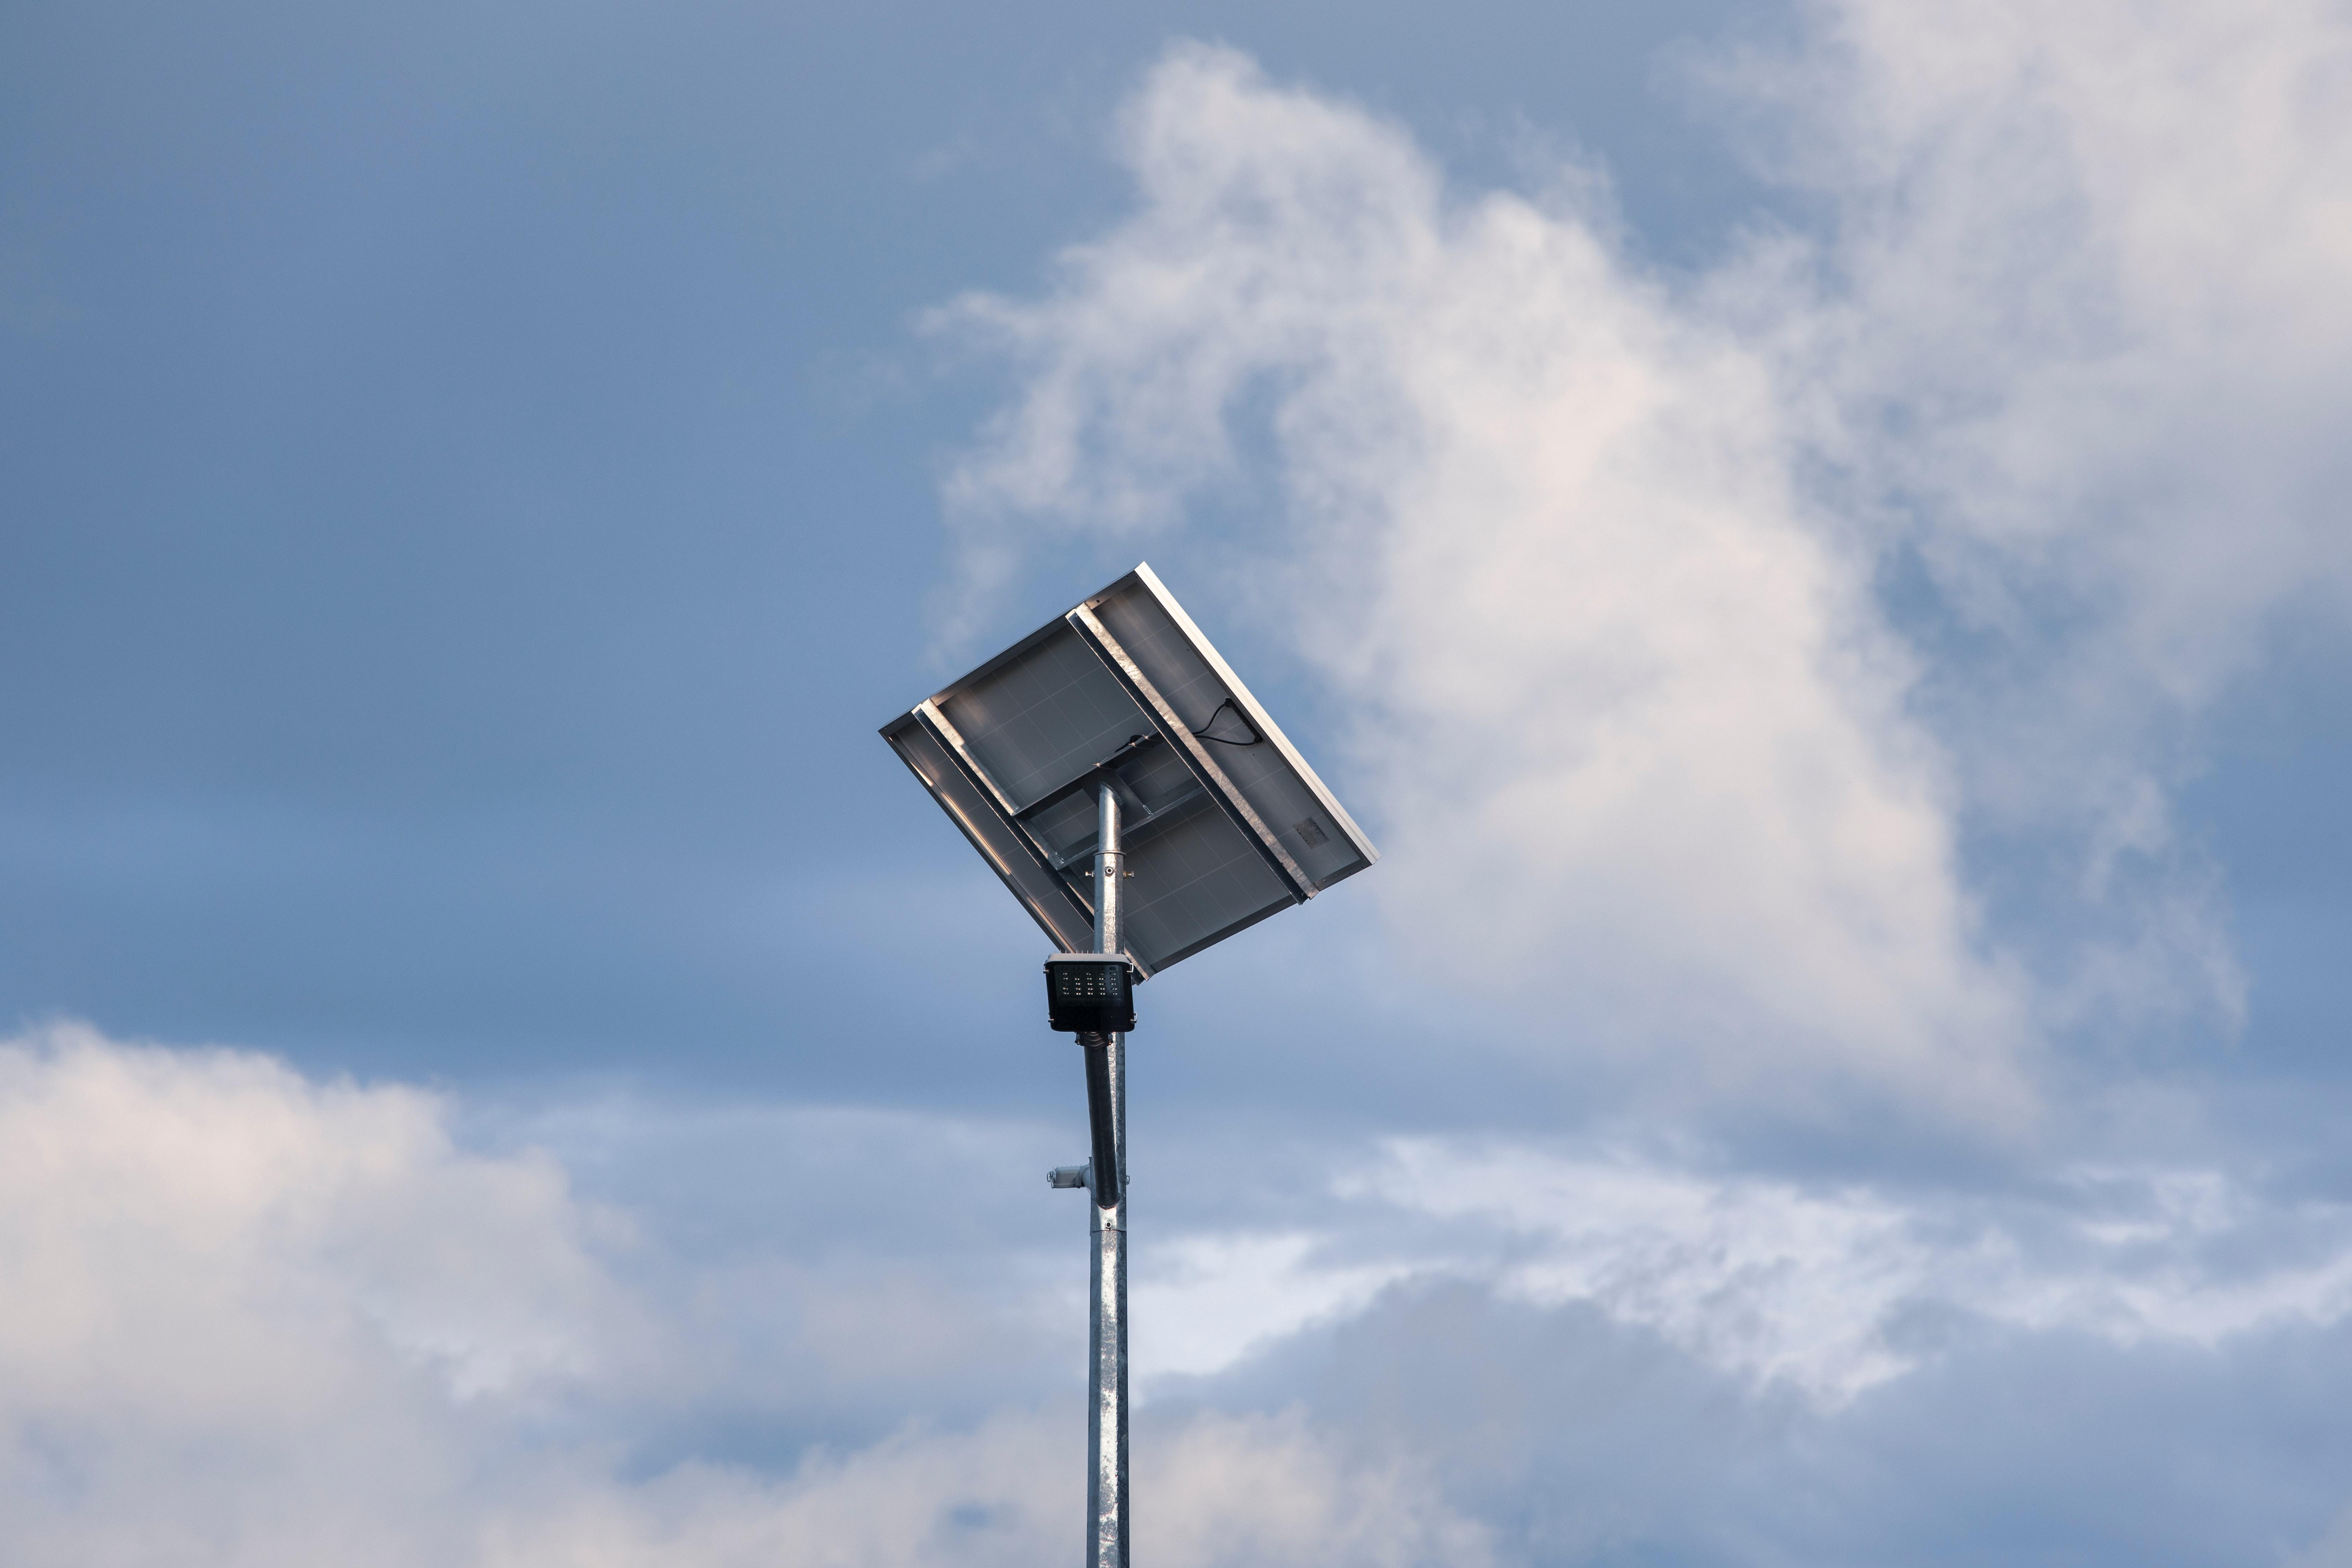 Solar Flood Lights: How Do They Work and How Long Do They Last